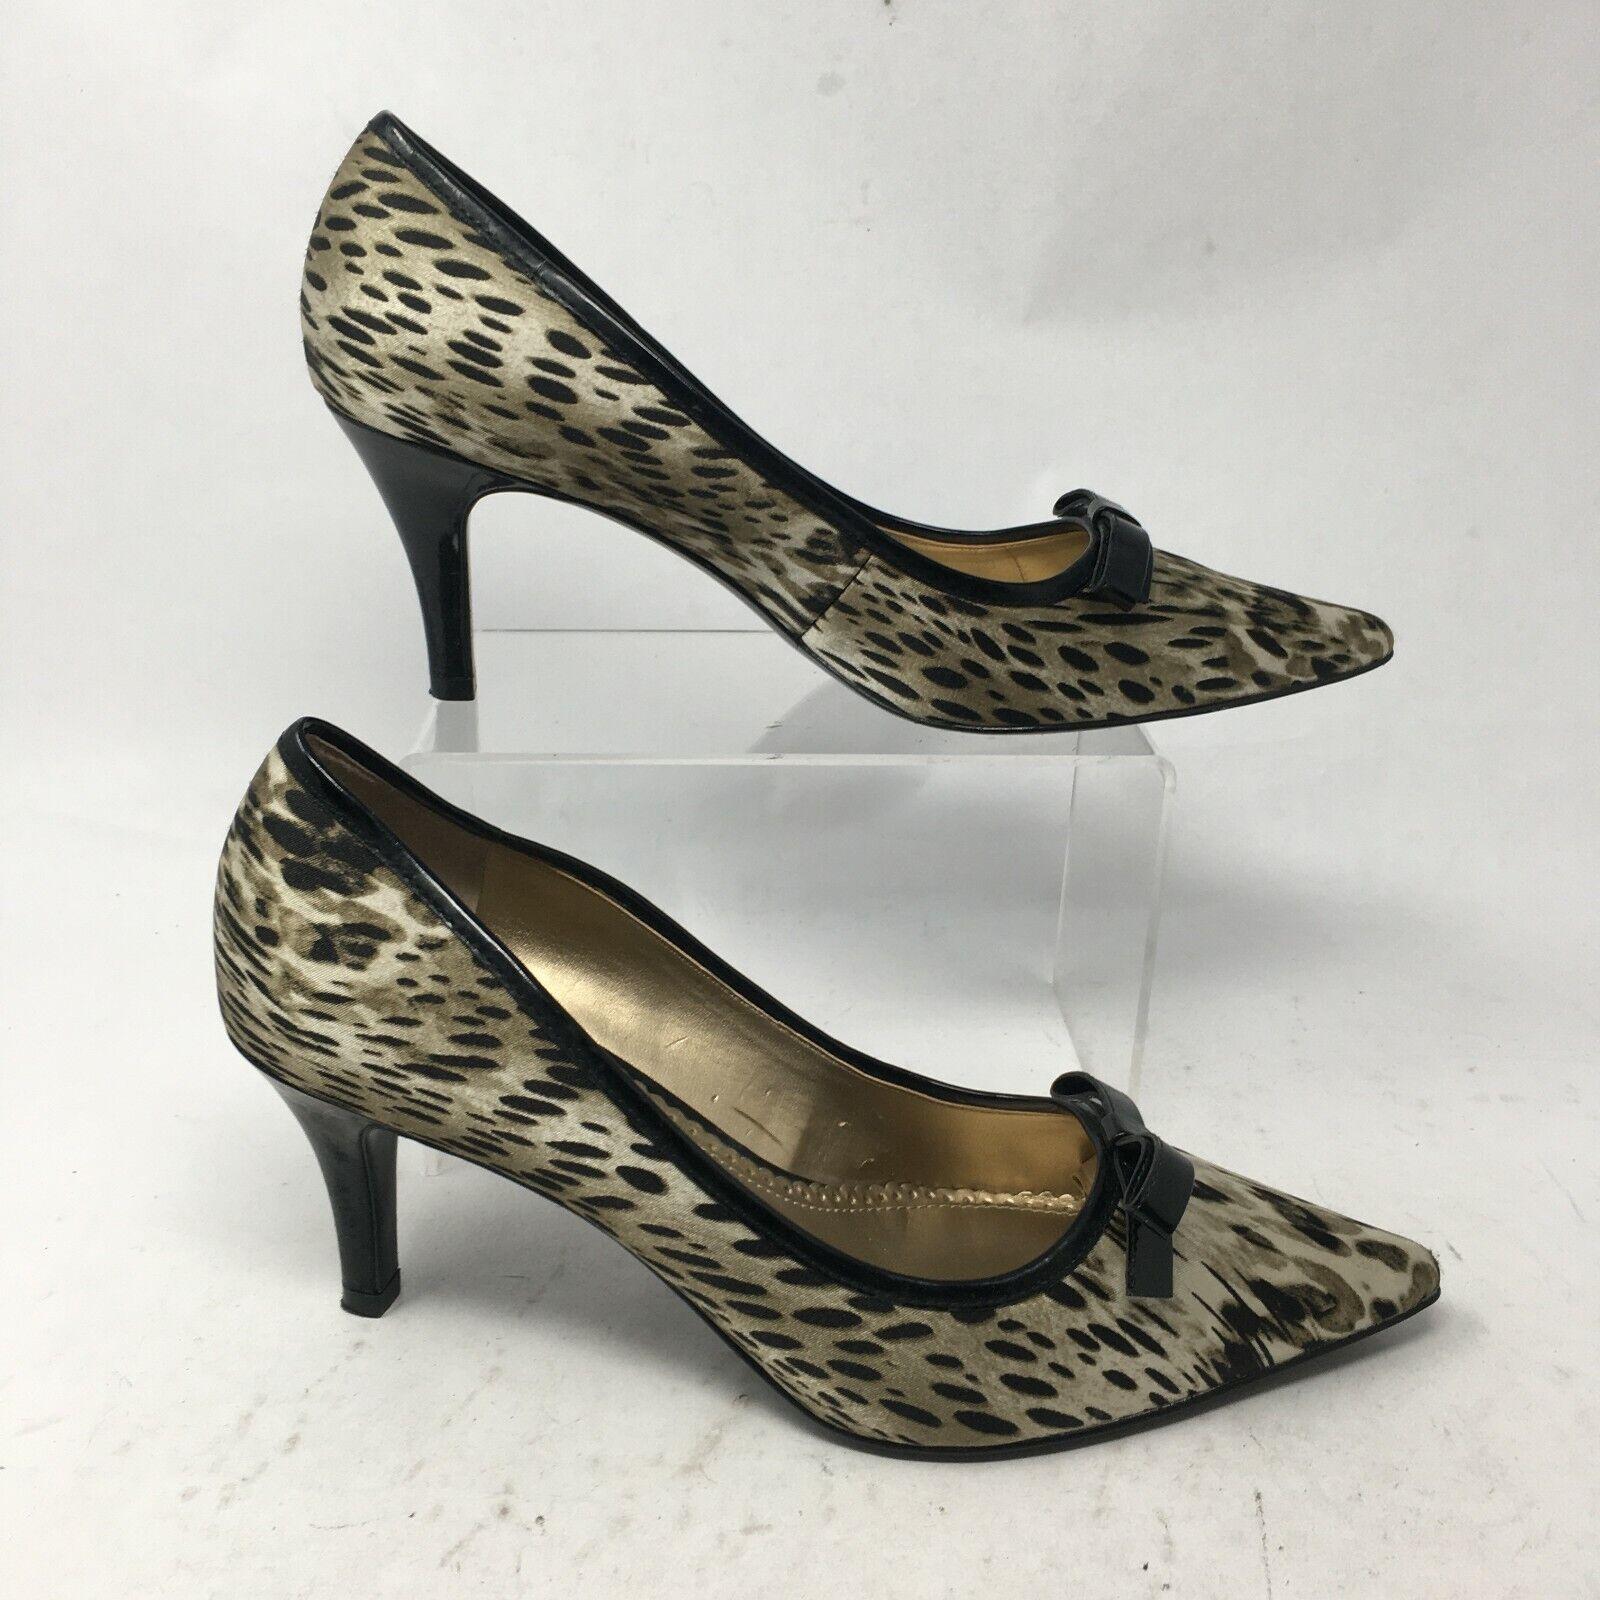 Anne Klein Womens 8.5M Witney Cheetah Print Pumps Stiletto Heels Pointed Toe Bow